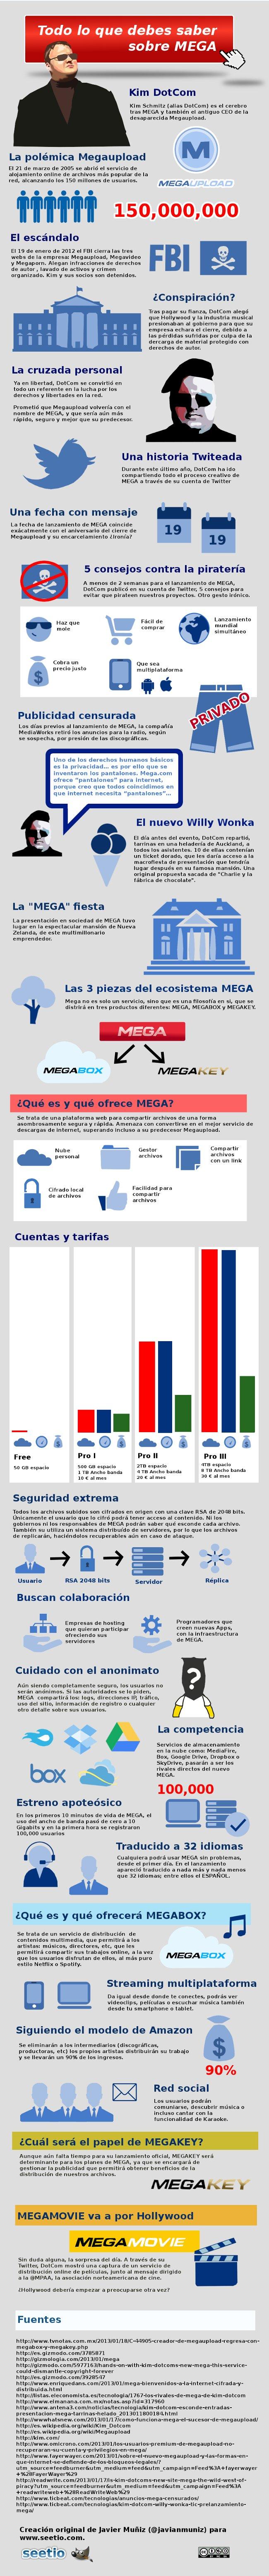 Actualidad Informática. Infografía sobre Mega. Rafael Barzanallana. UMU